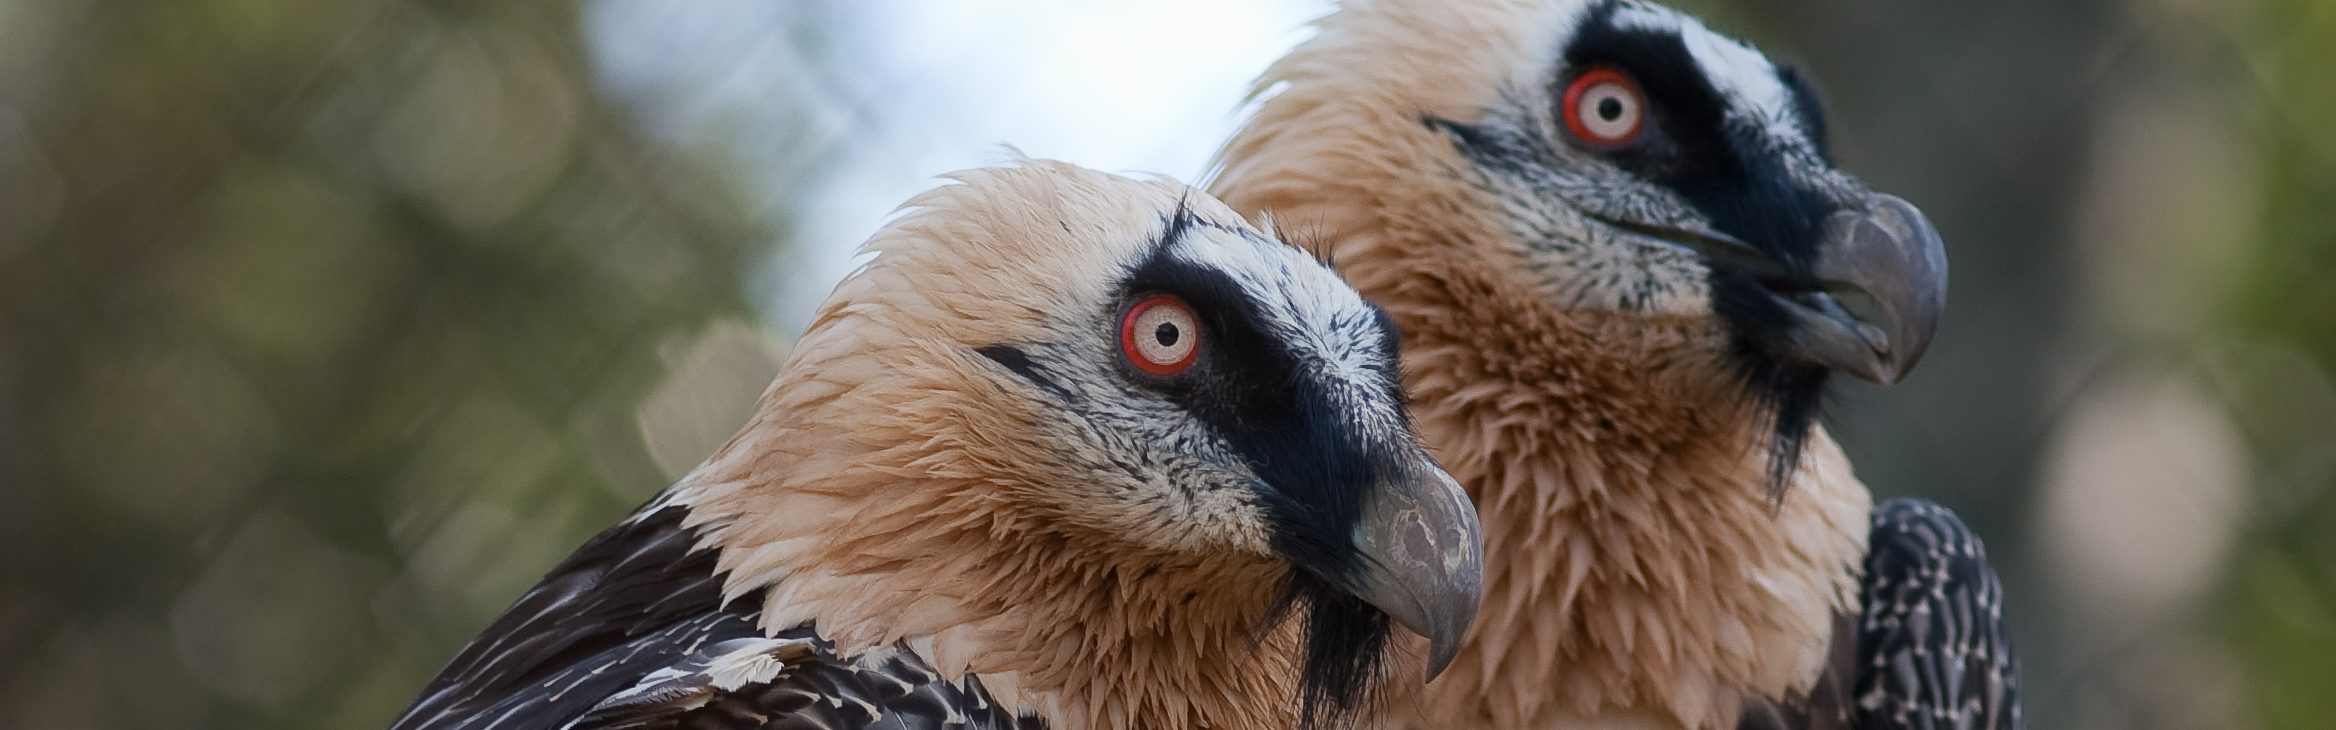 https://faunafocus.com/home/may-2018-bearded-vulture/#jp-carousel-7877